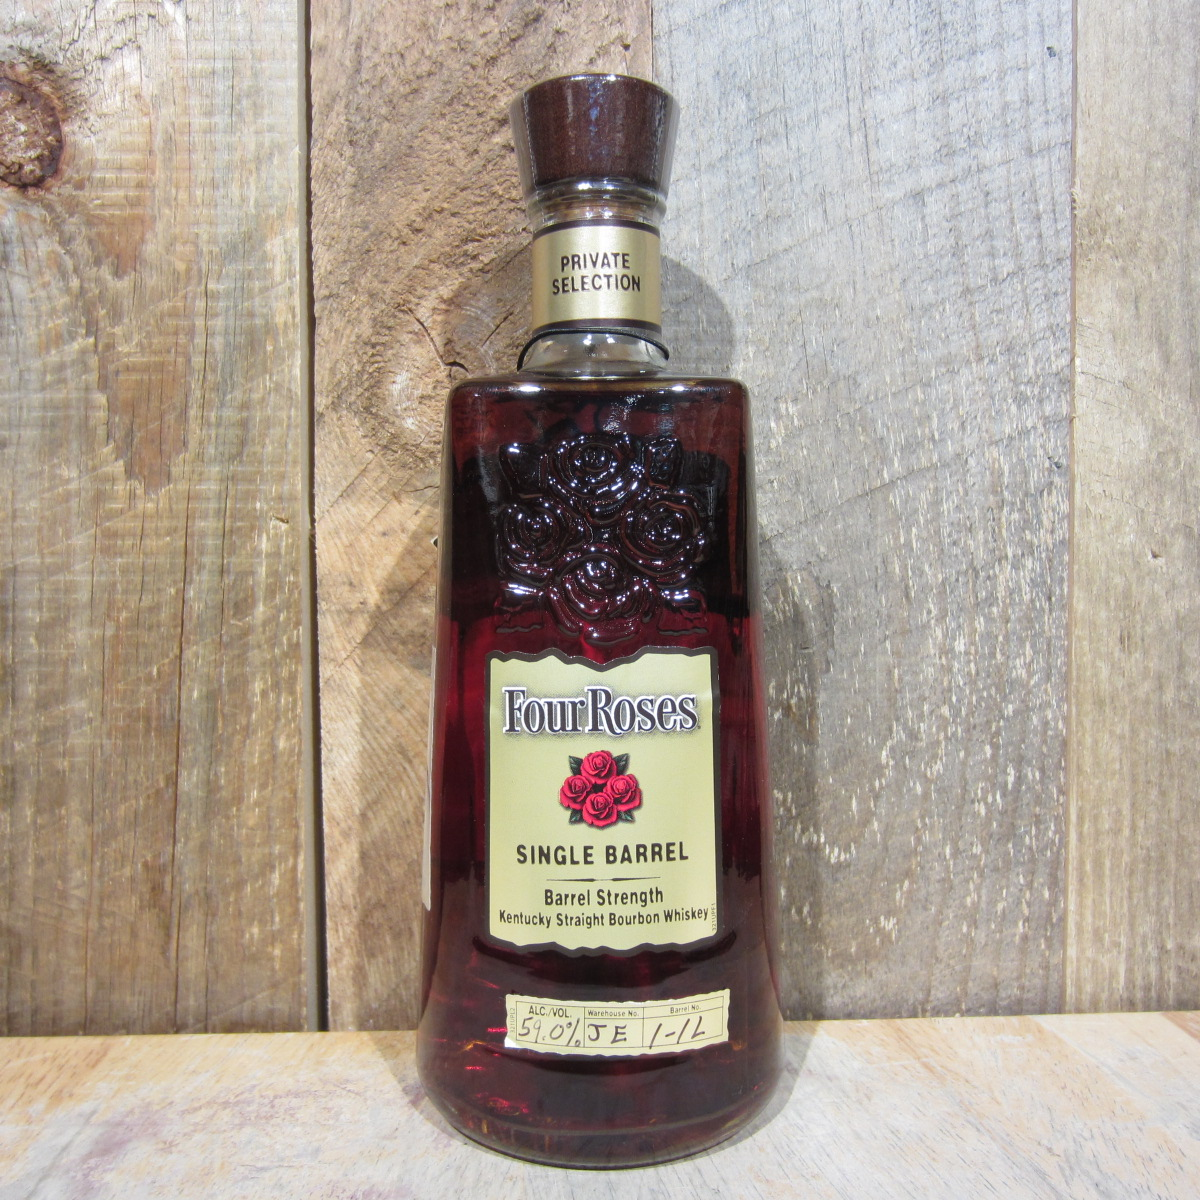 Four Roses Single Barrel Bourbon OBSV PS 118 750ml